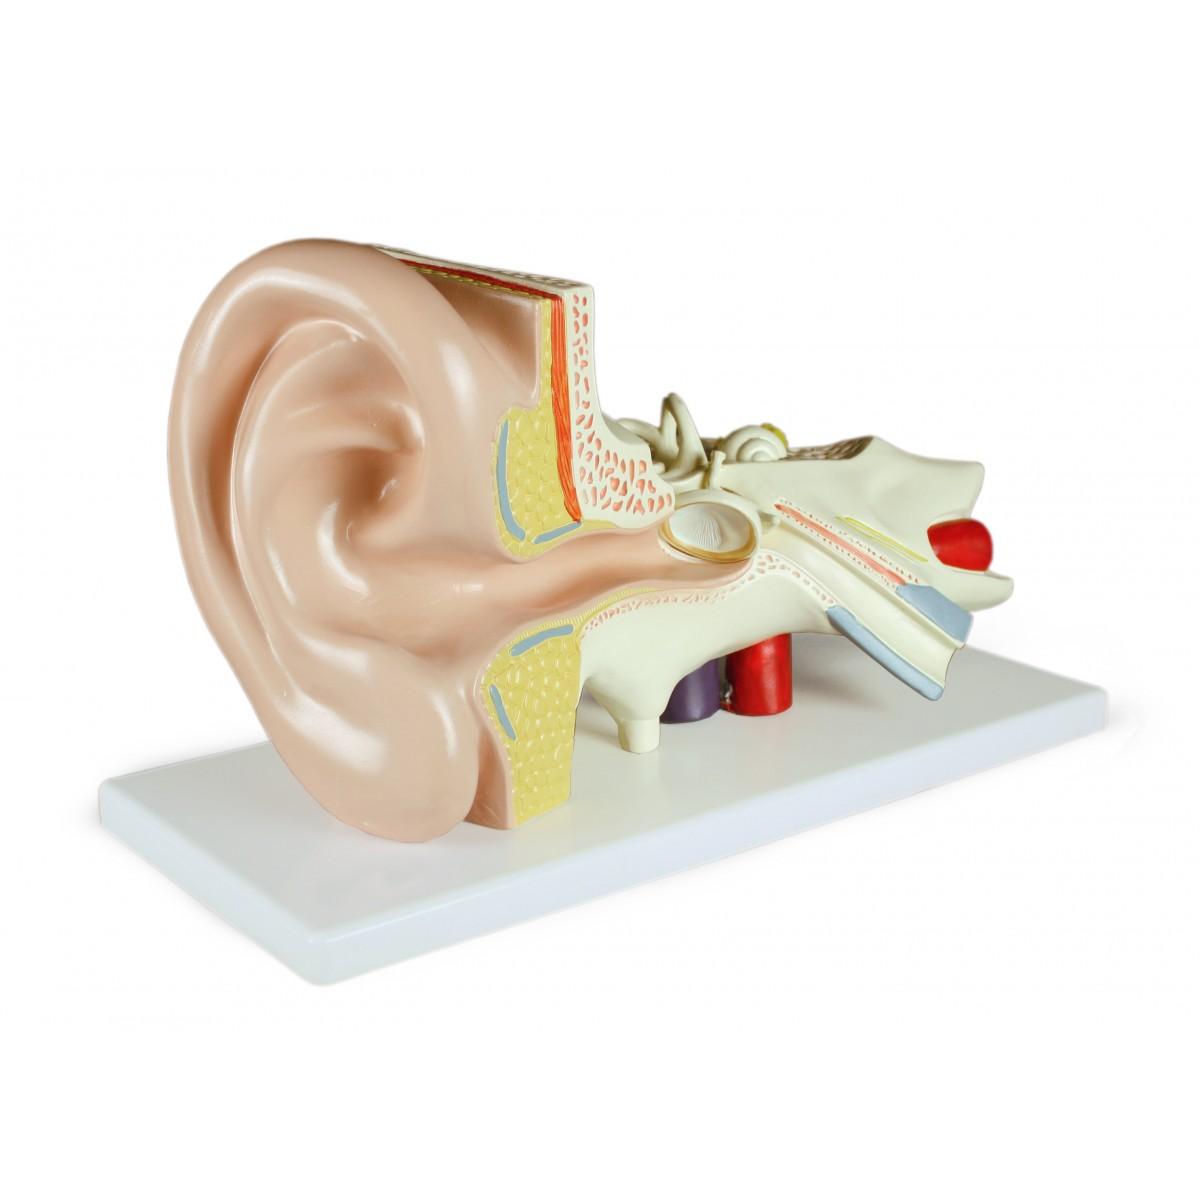 Walter Ear Model, 3 Parts - Sense Organs - Human Anatomy - Biology